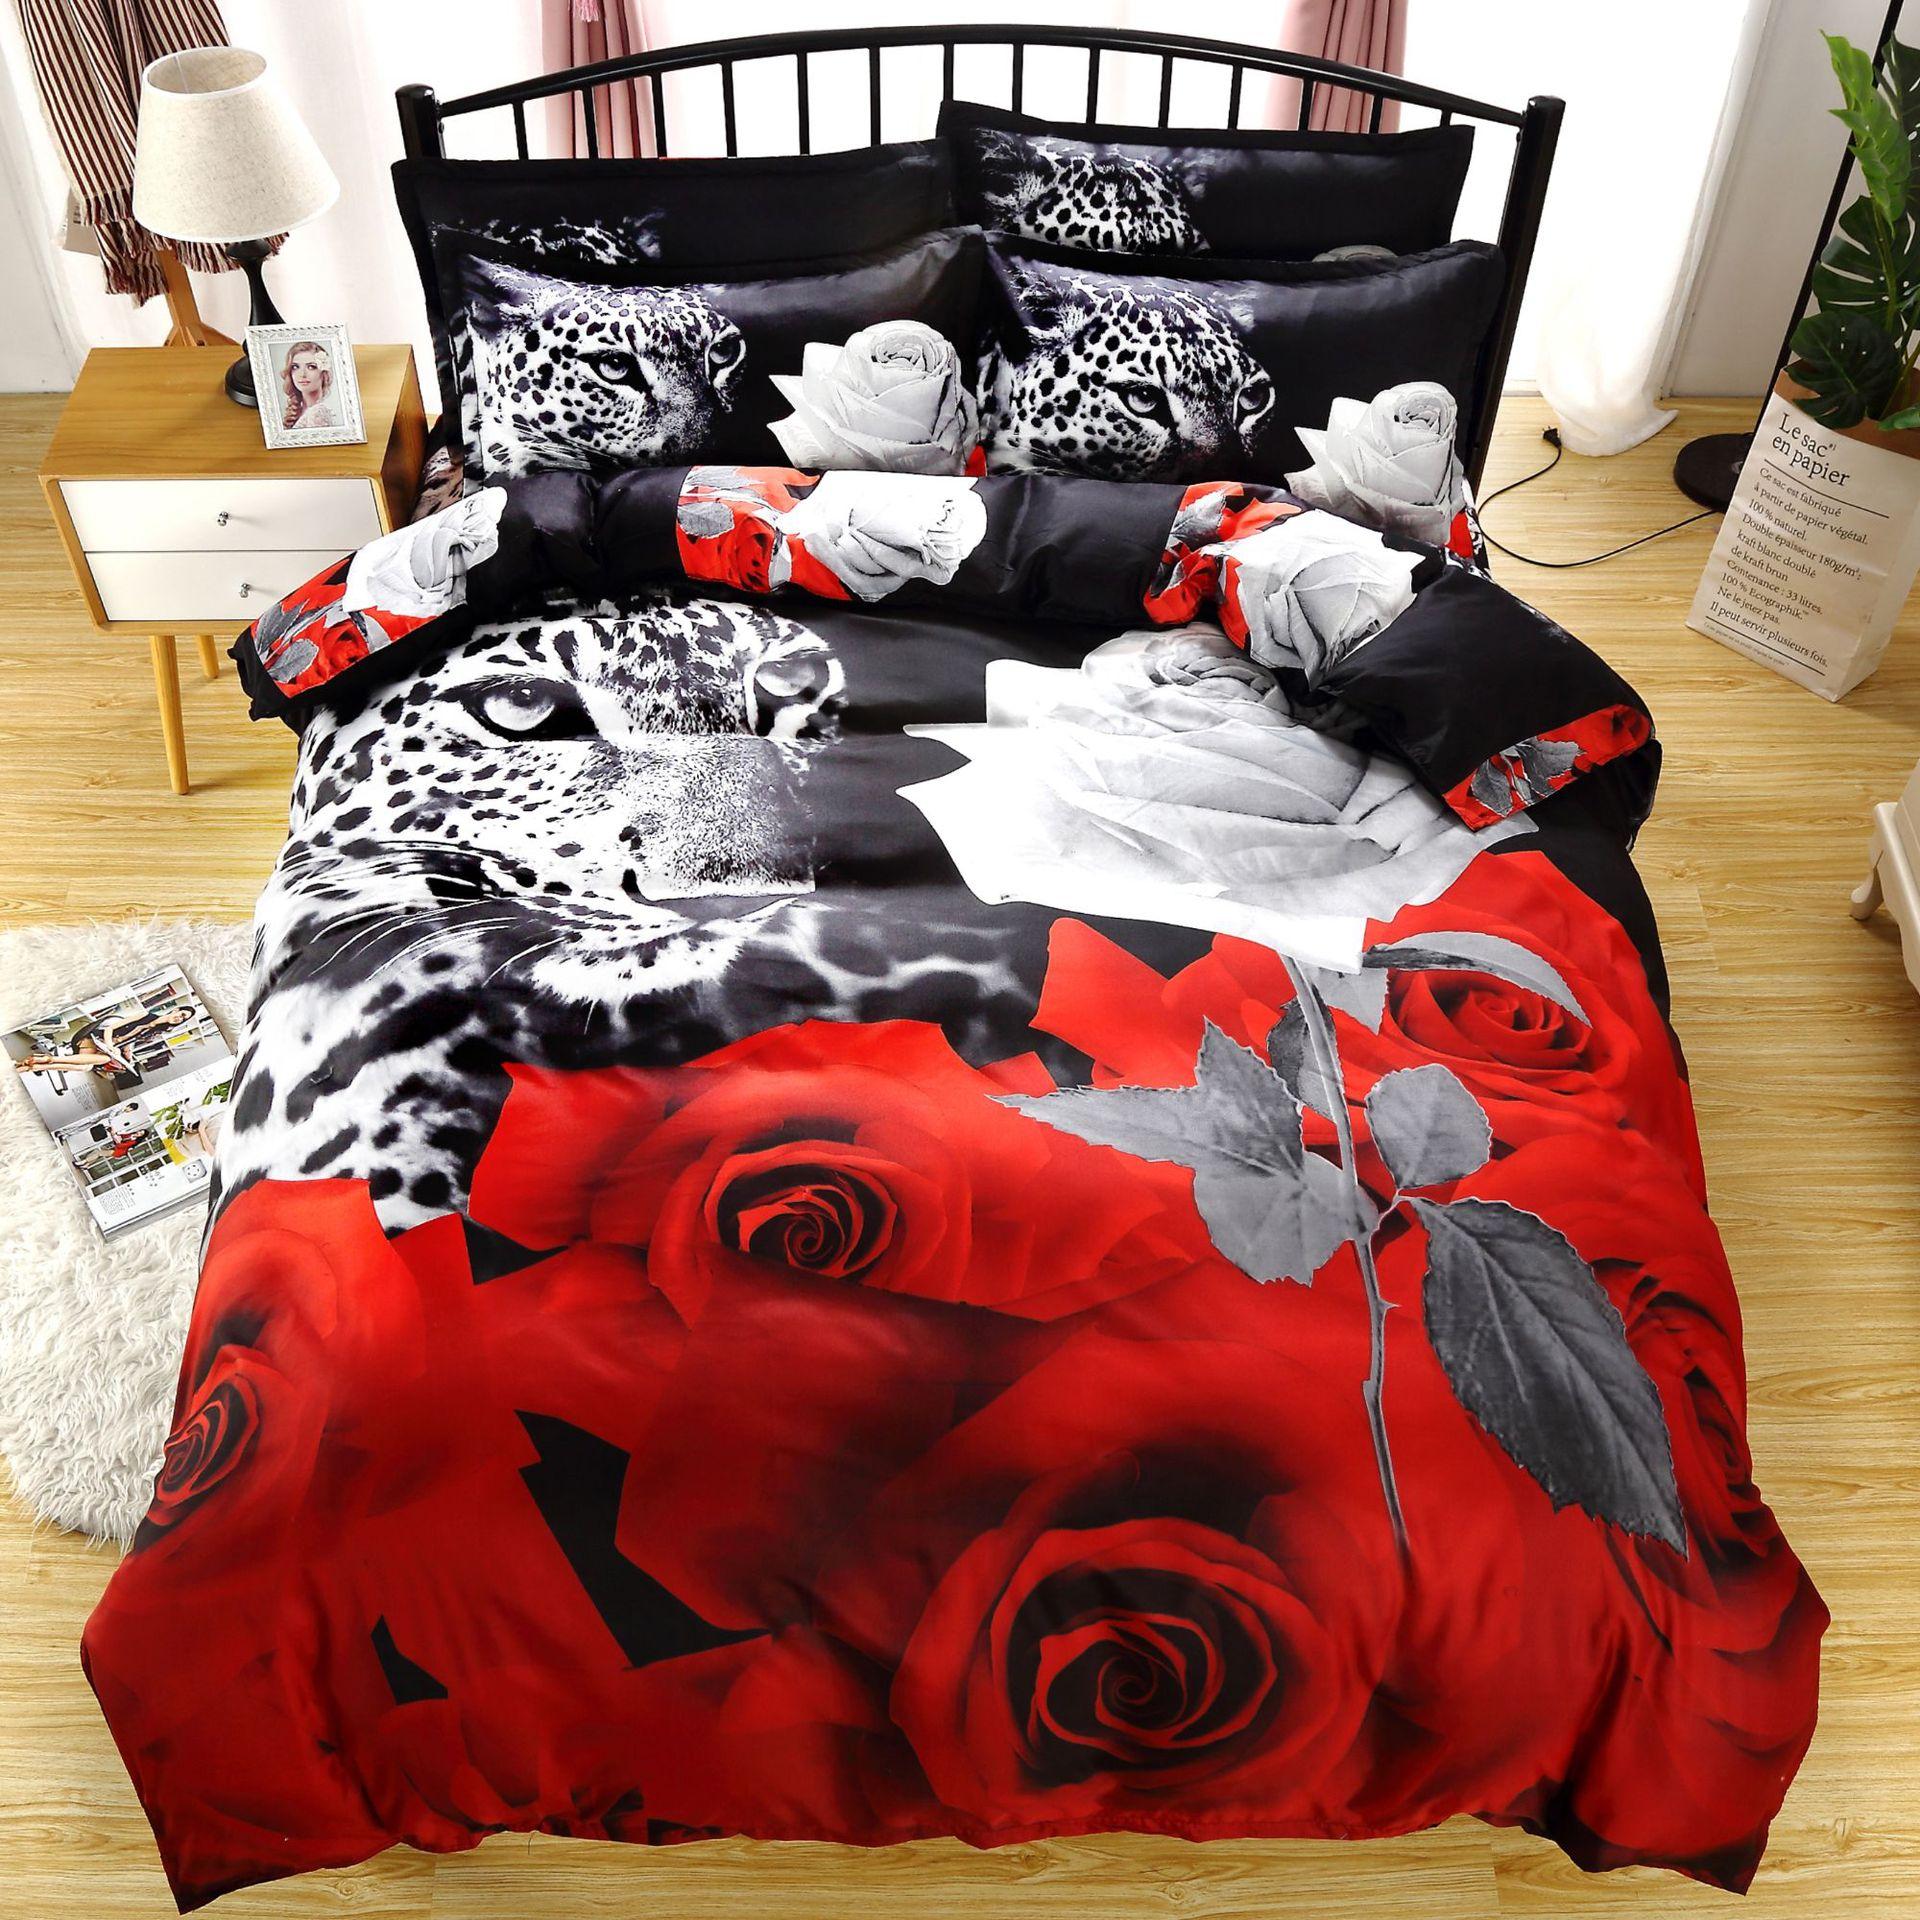 Achcual الحيوان ليوبارد روز طقم سرير حجم الملك لا ملاءات حاف مجموعة غطاء سرير مزدوج المنسوجات المنزلية الطباعة الرقمية be90